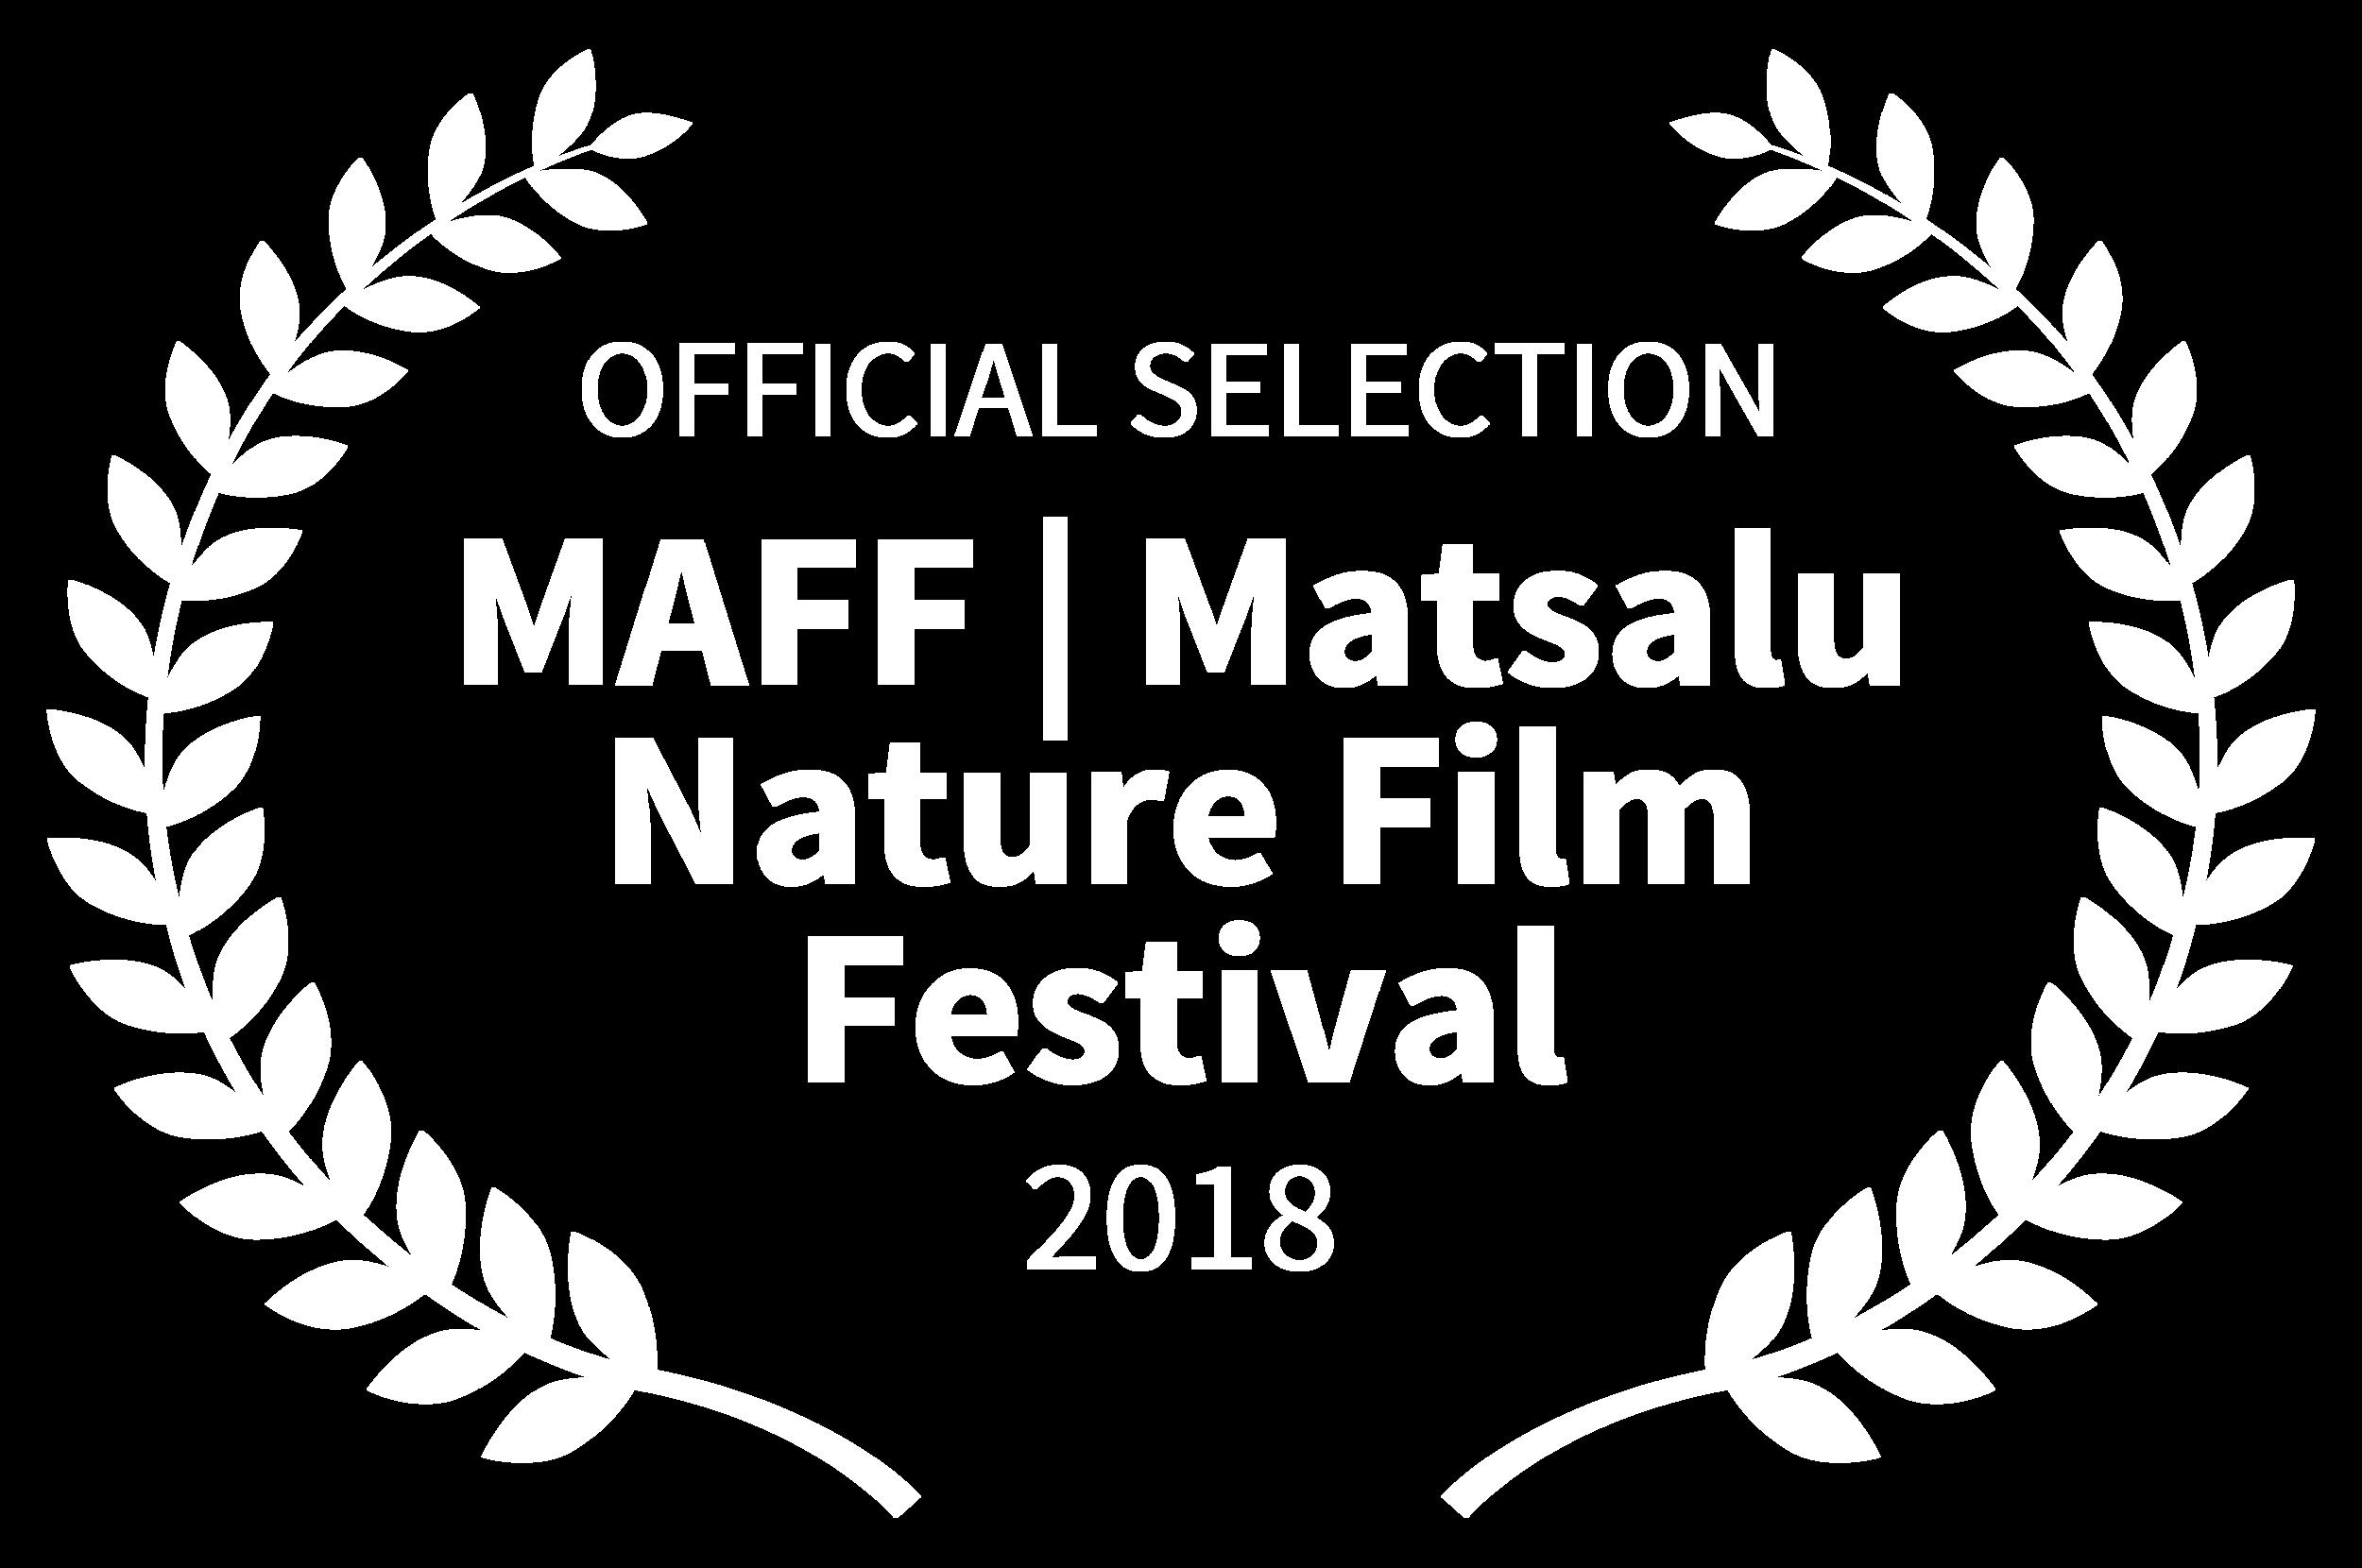 2018_MAFFMatsaluNatureFF_WhiteLaurels.png